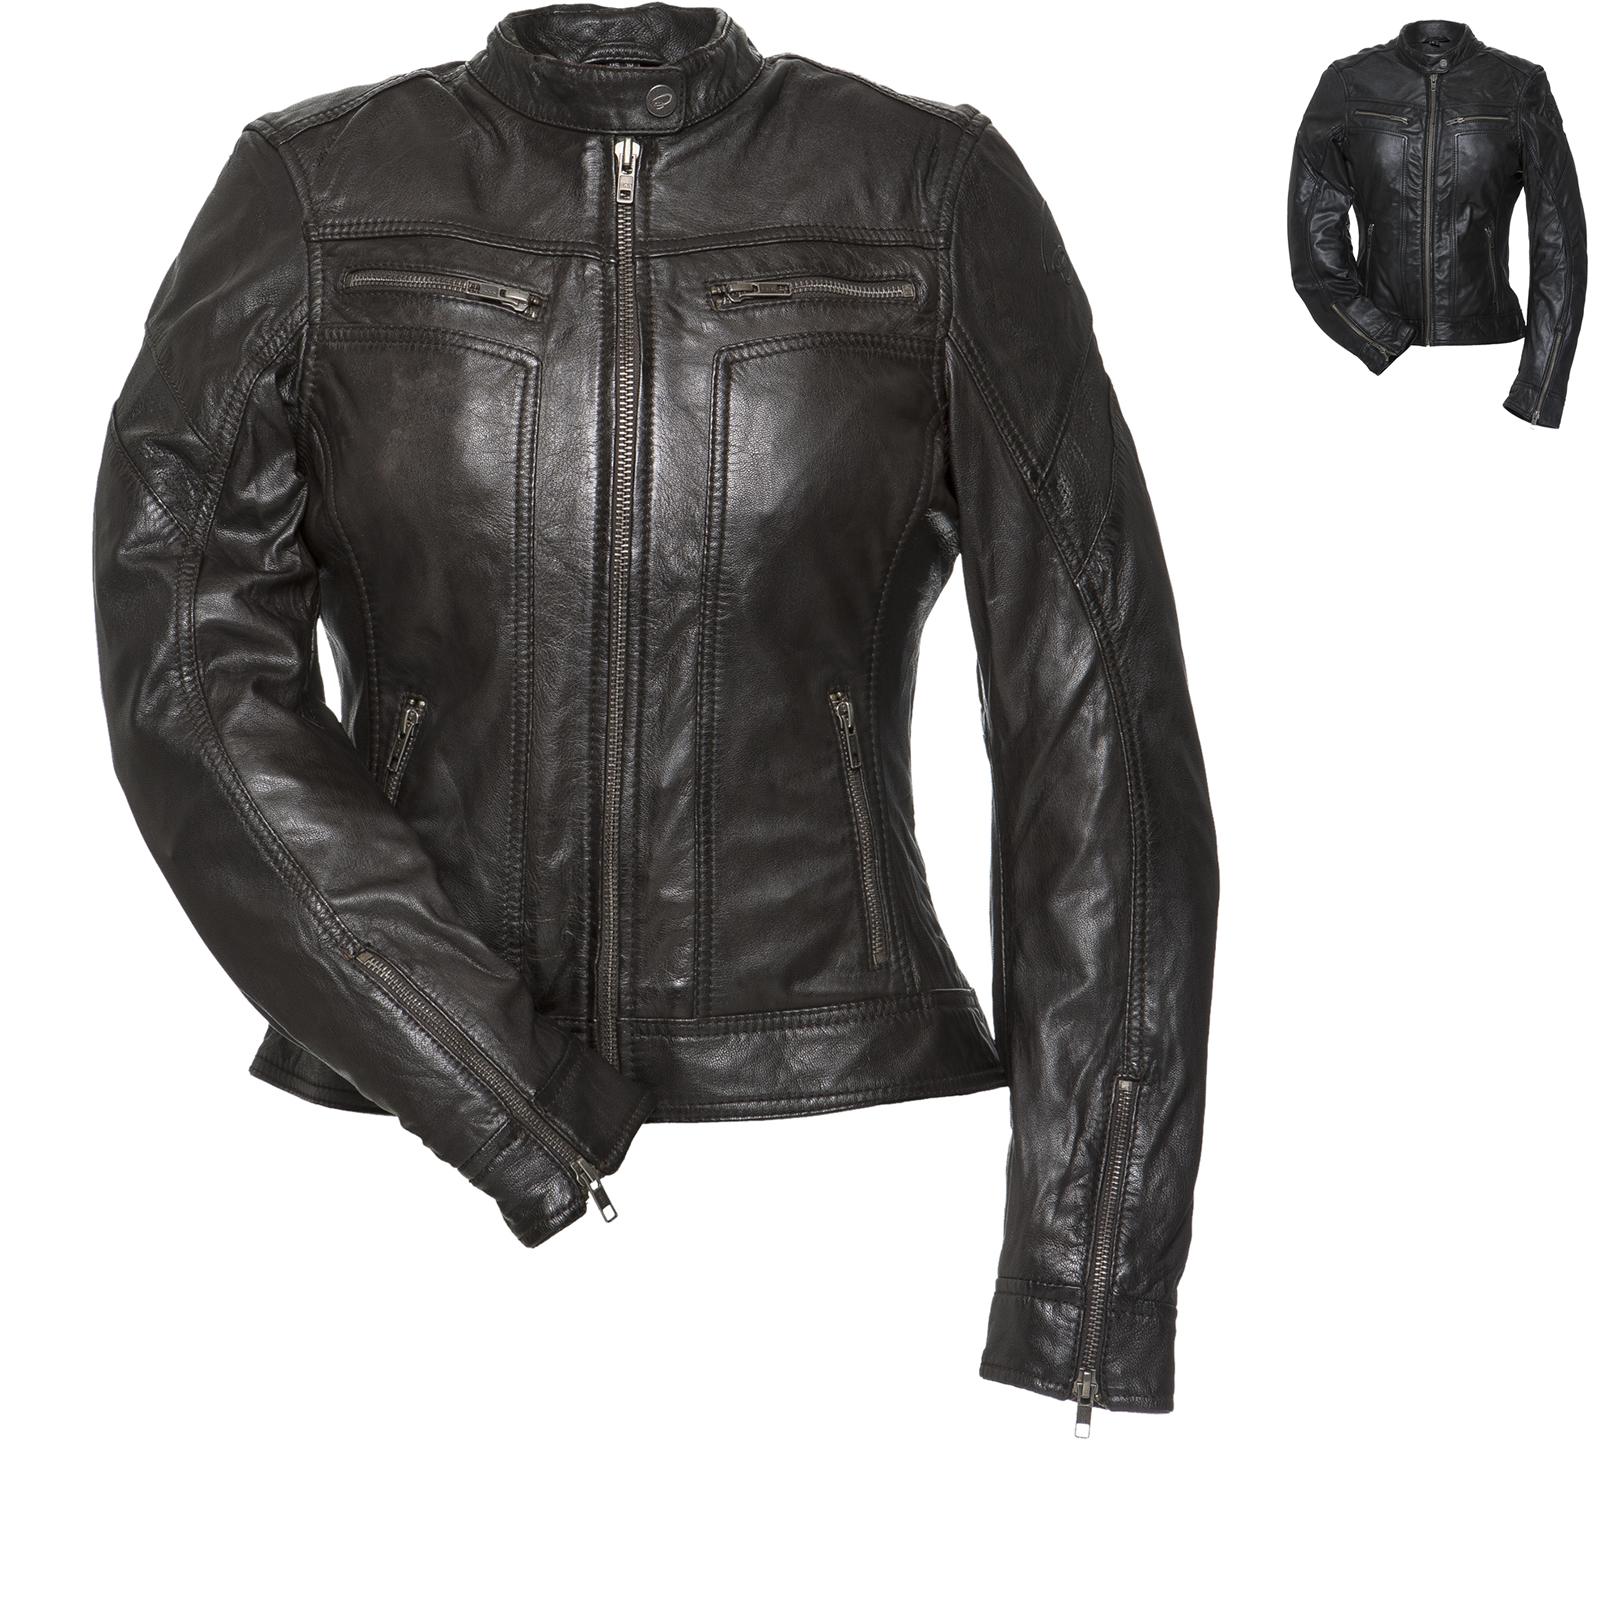 NEW CUSTOM 4599 BLACK MOTORBIKE MOTORCYCLE COWHIDE LEATHER CE ARMOURED JACKET